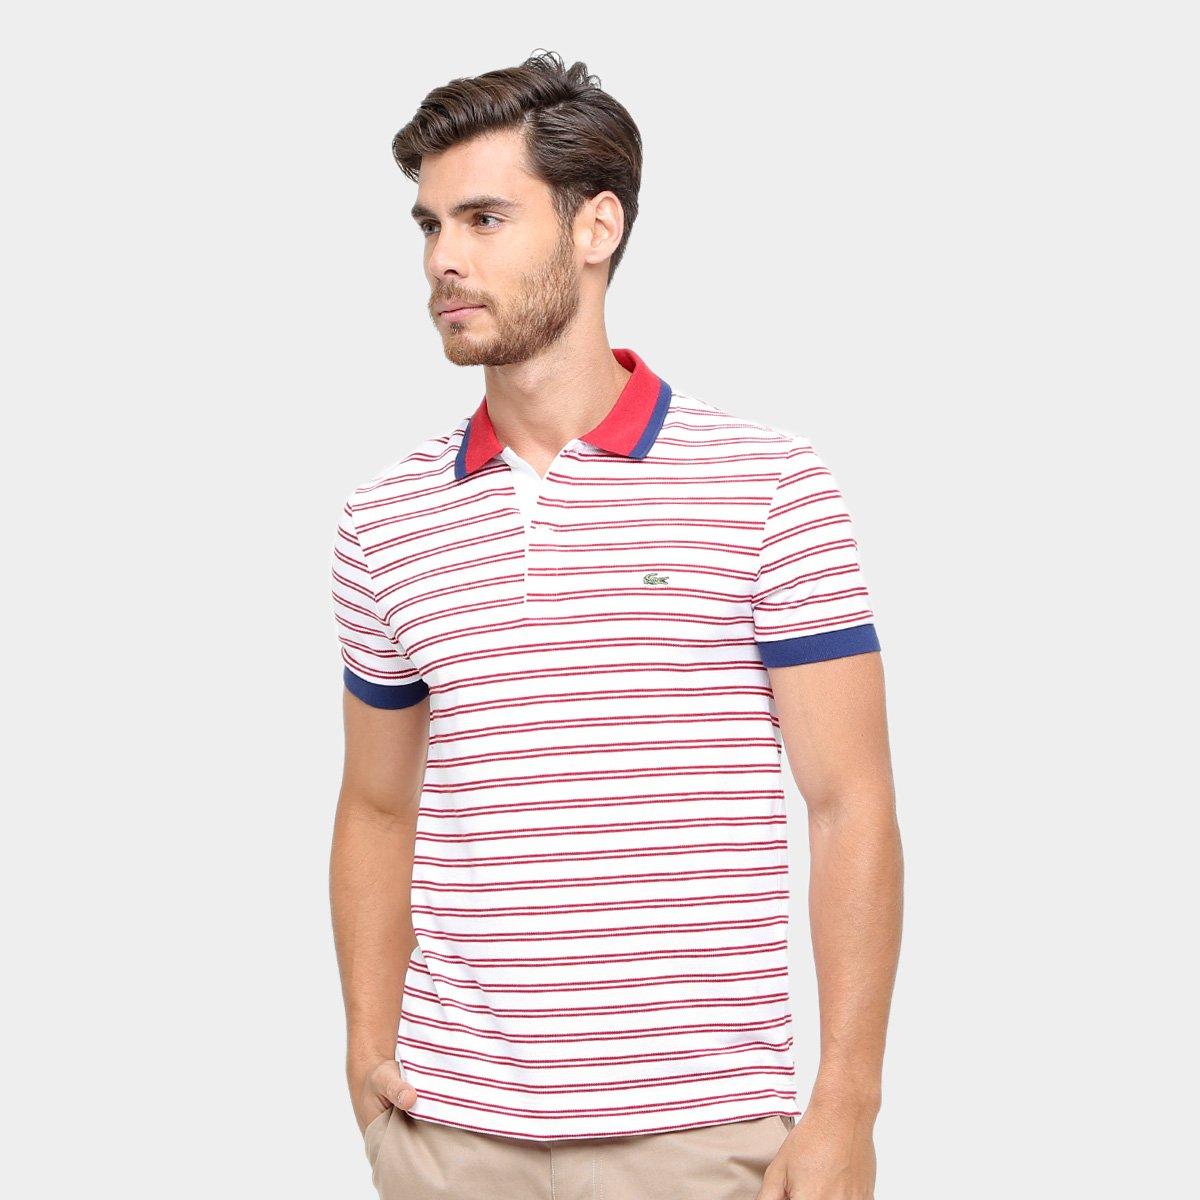 db0cdf8a2f7bd Camisa Polo Lacoste Piquet Fit Listras Color Masculina - Compre Agora